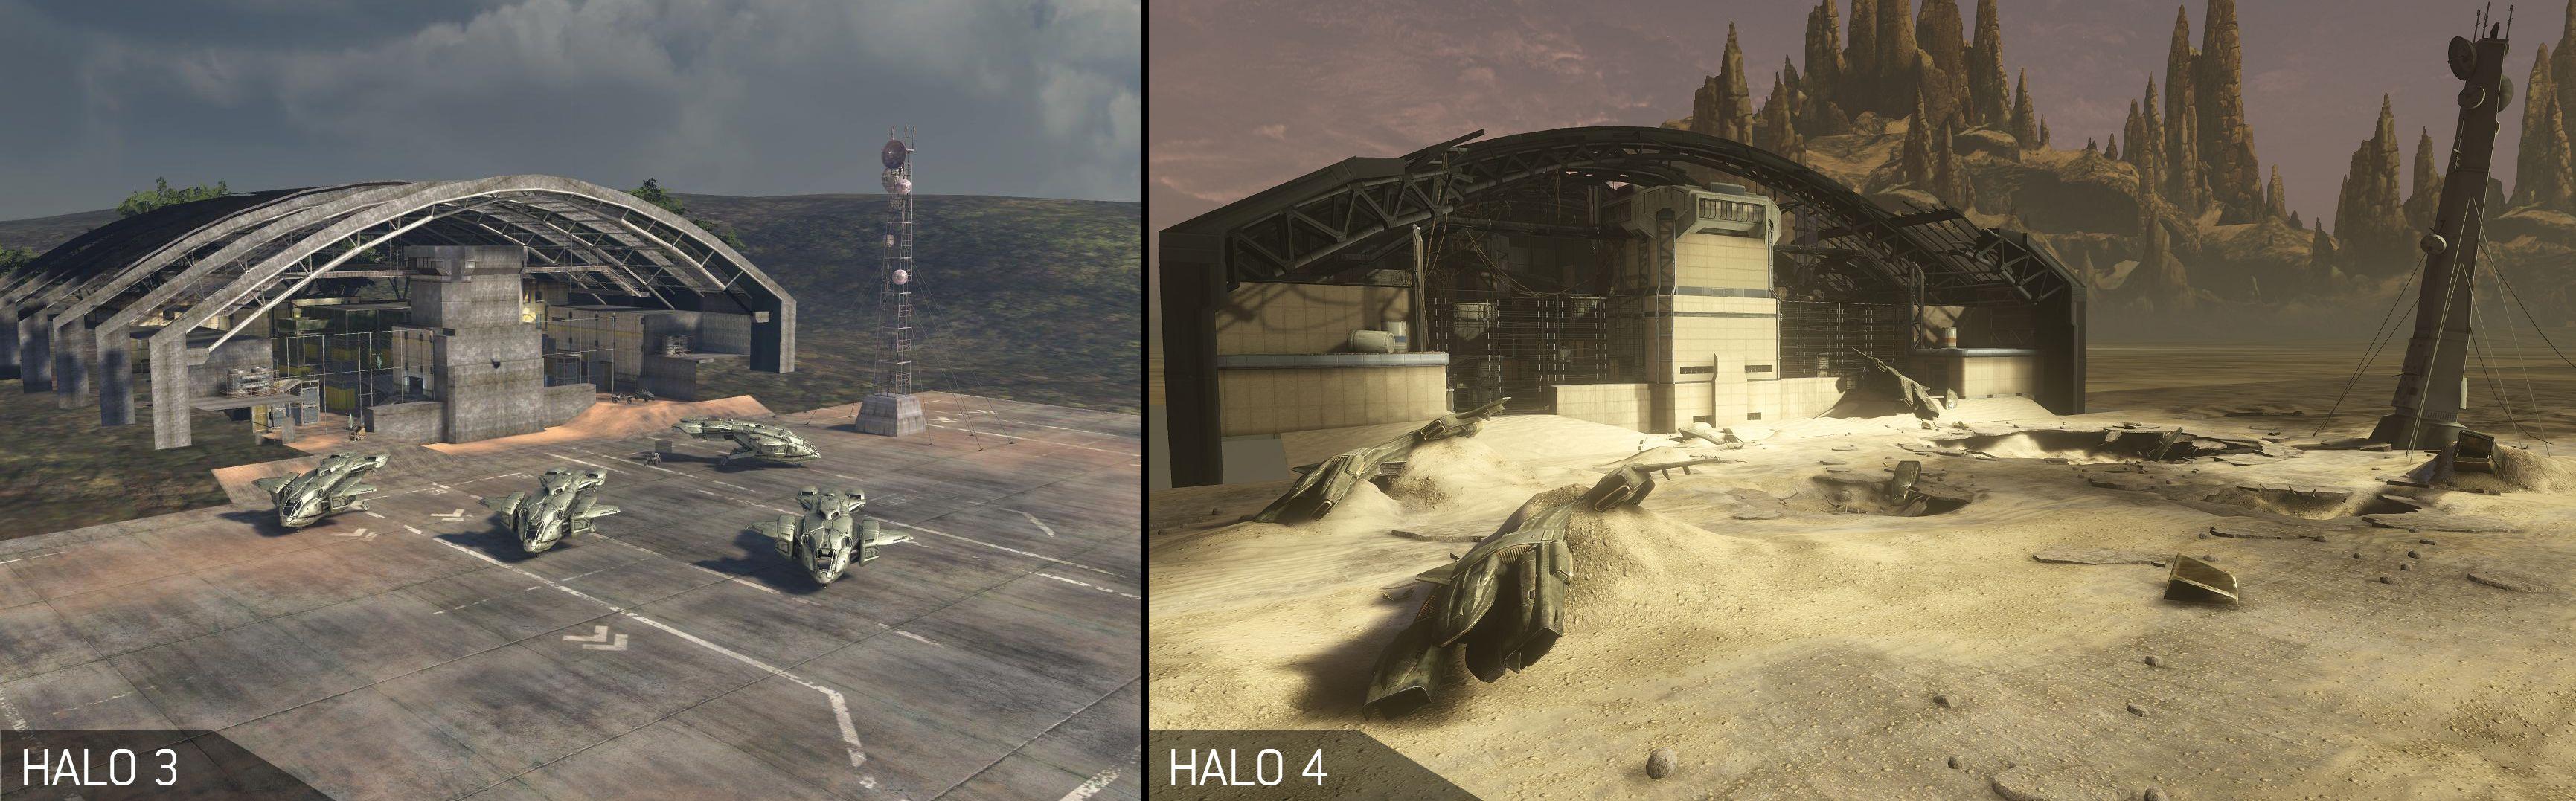 Halo 3 Halo 4 Pit Comparison